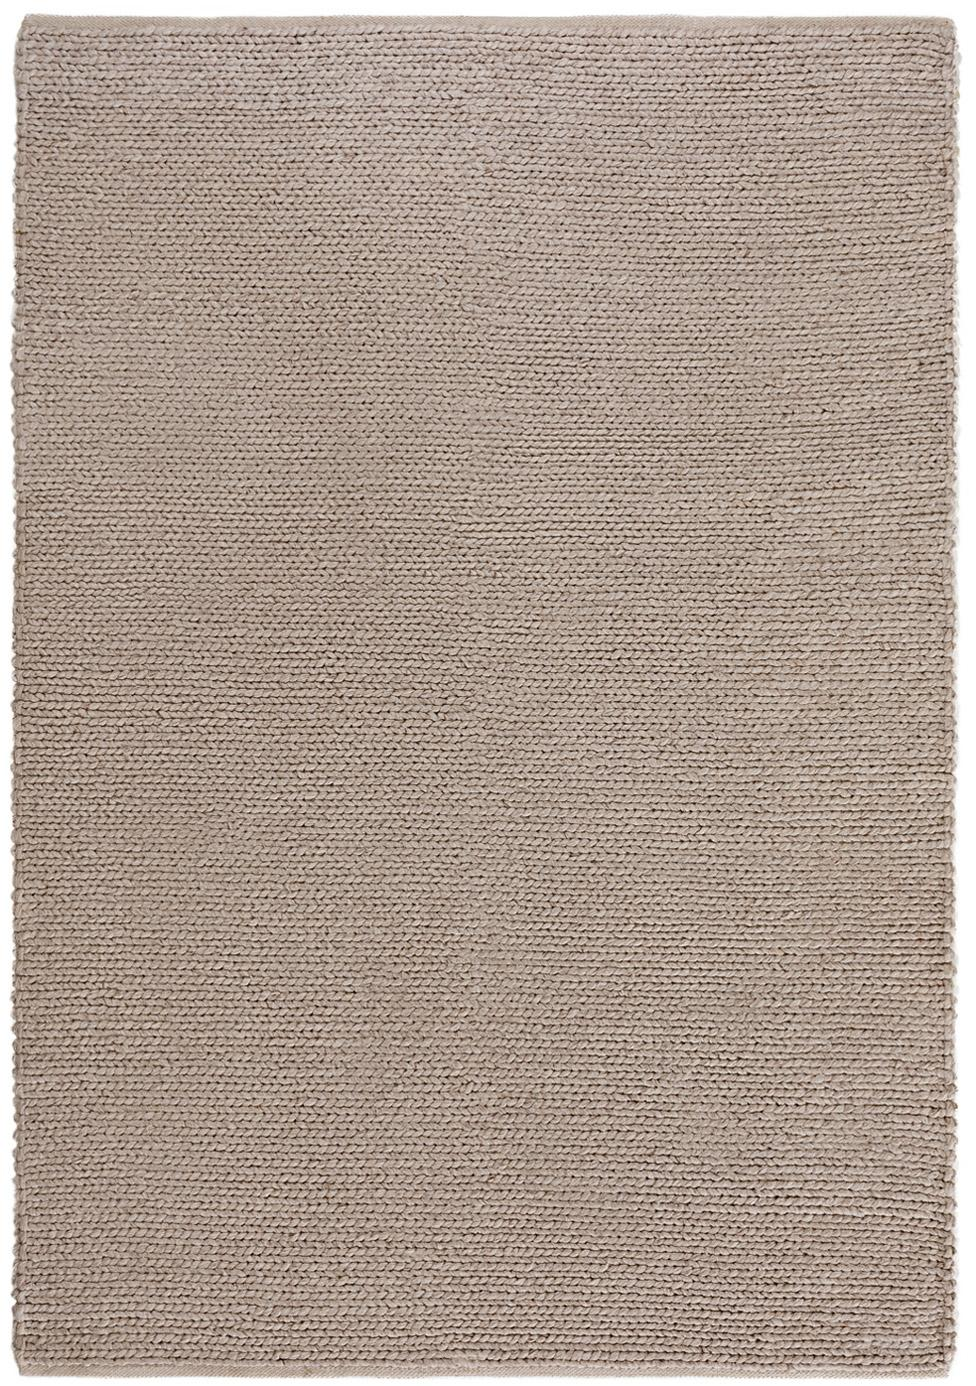 Handgewebter Wollteppich Uno in Taupe, Flor: 60% Wolle, 40% Polyester, Taupe, B 120 x L 170 cm (Größe S)